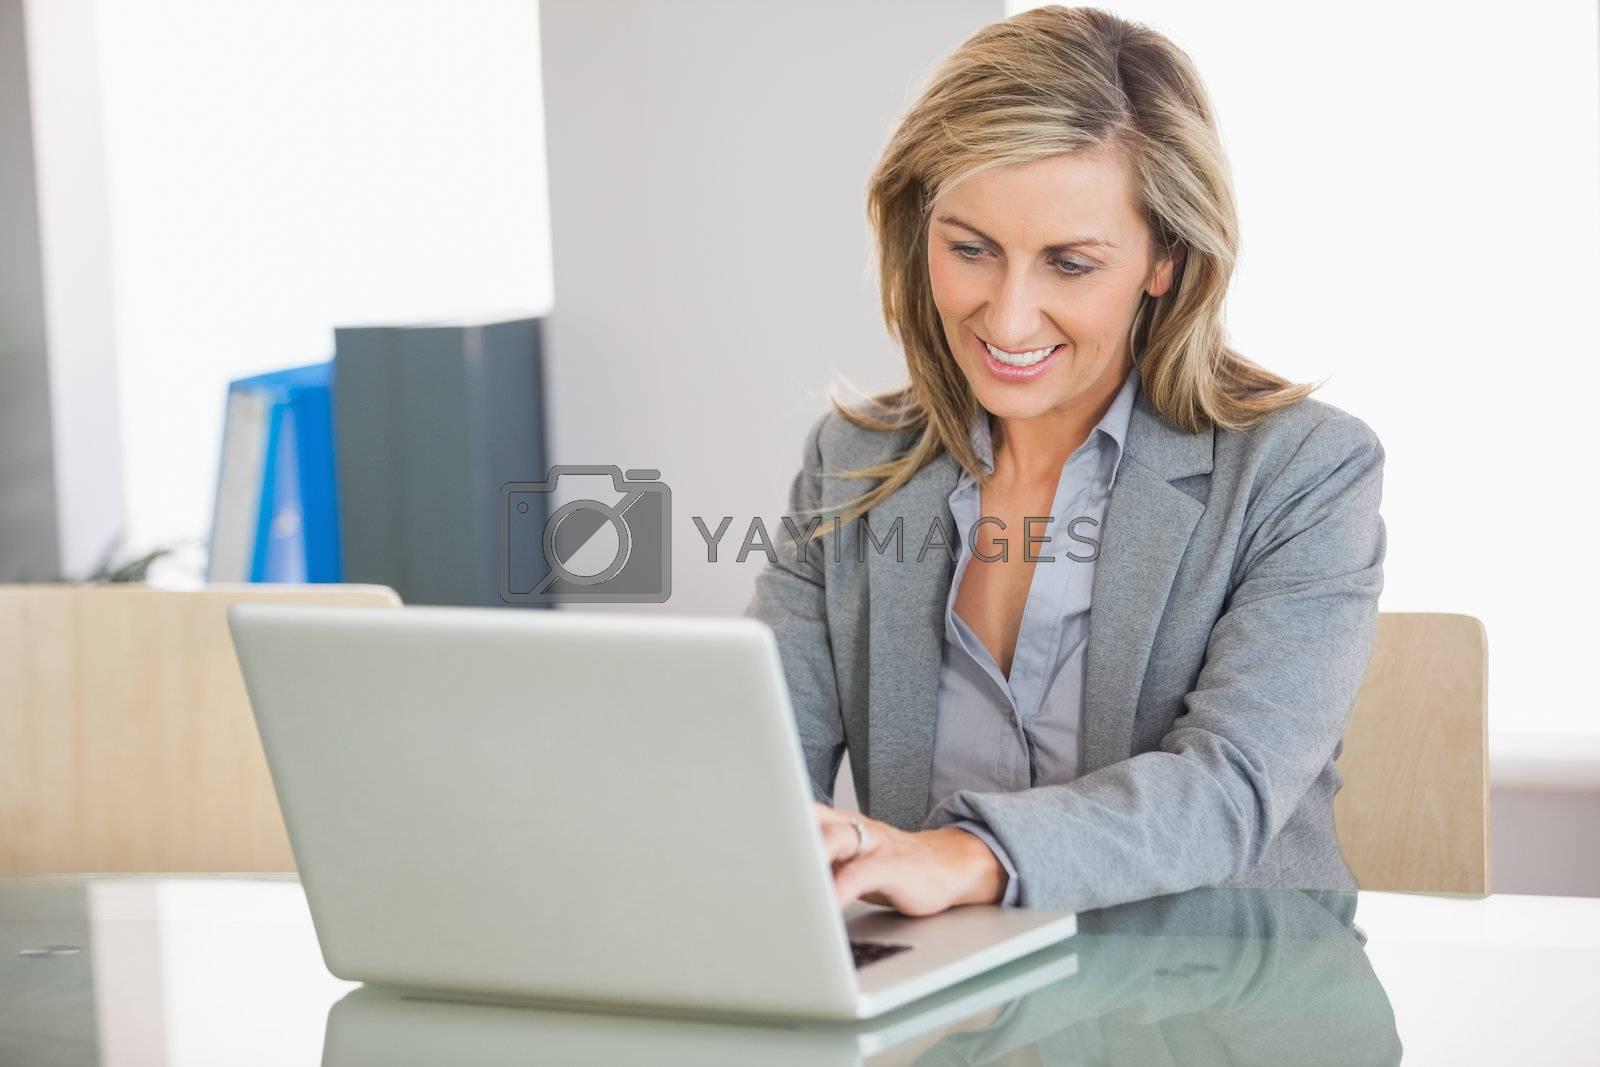 Businesswoman using a laptop in an office by Wavebreakmedia